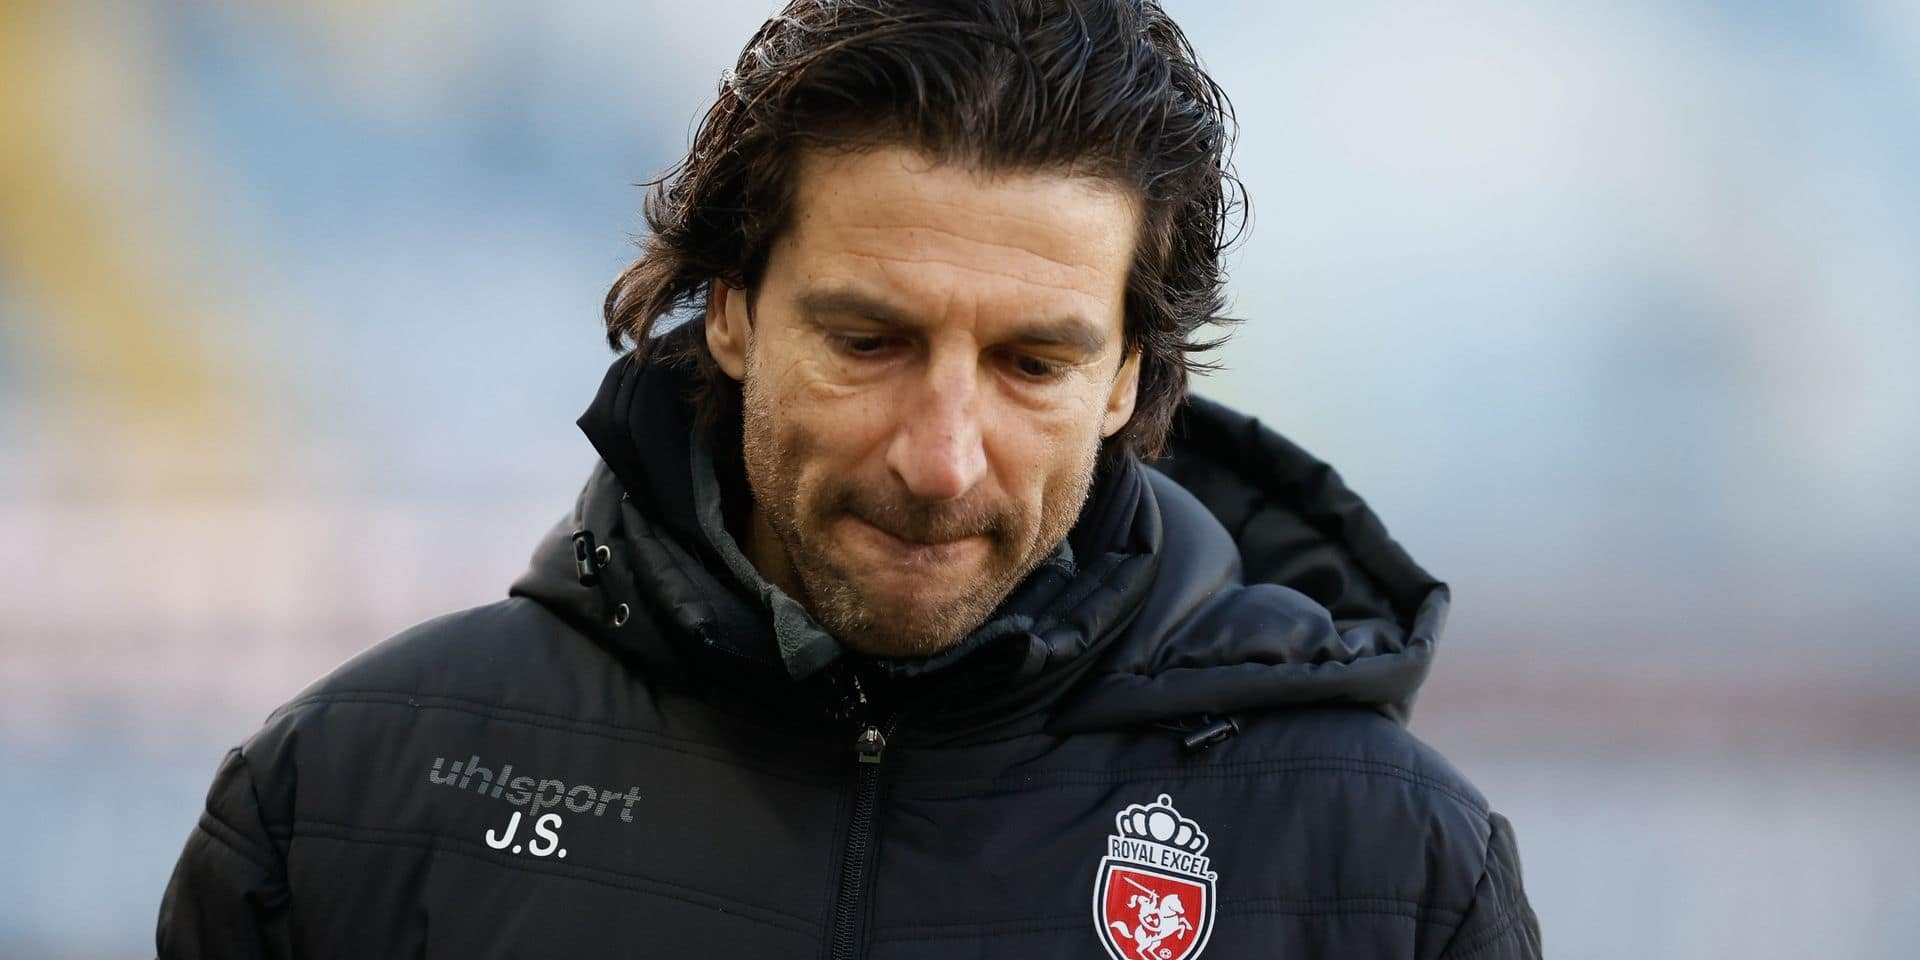 Jorge Simao quitte Mouscron et retourne au Portugal à Paços de Ferreira